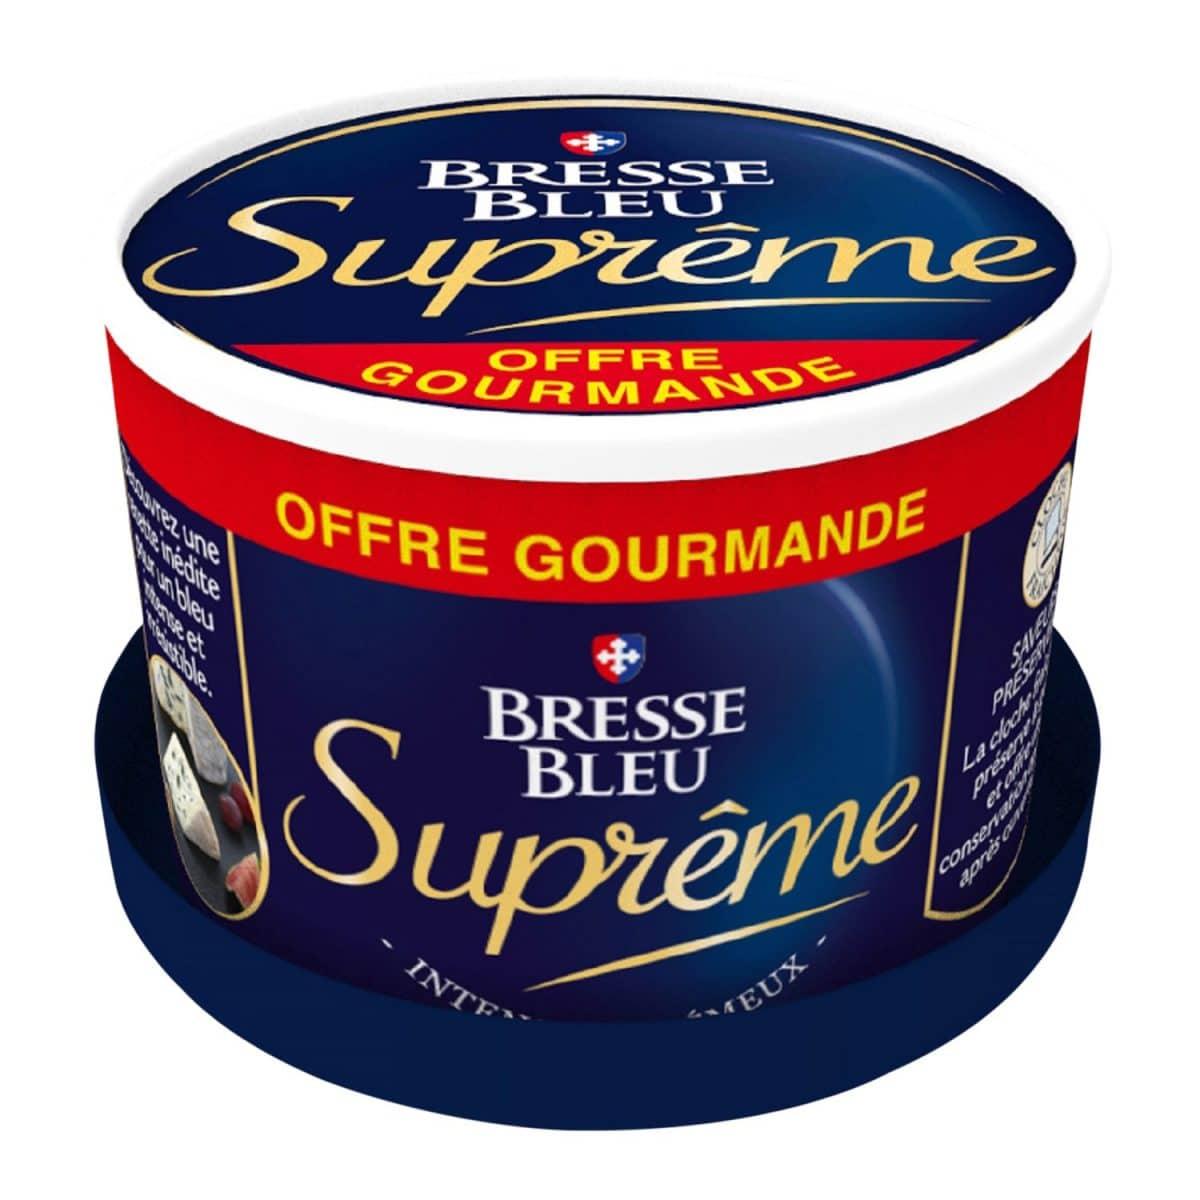 fromage bresse bleu